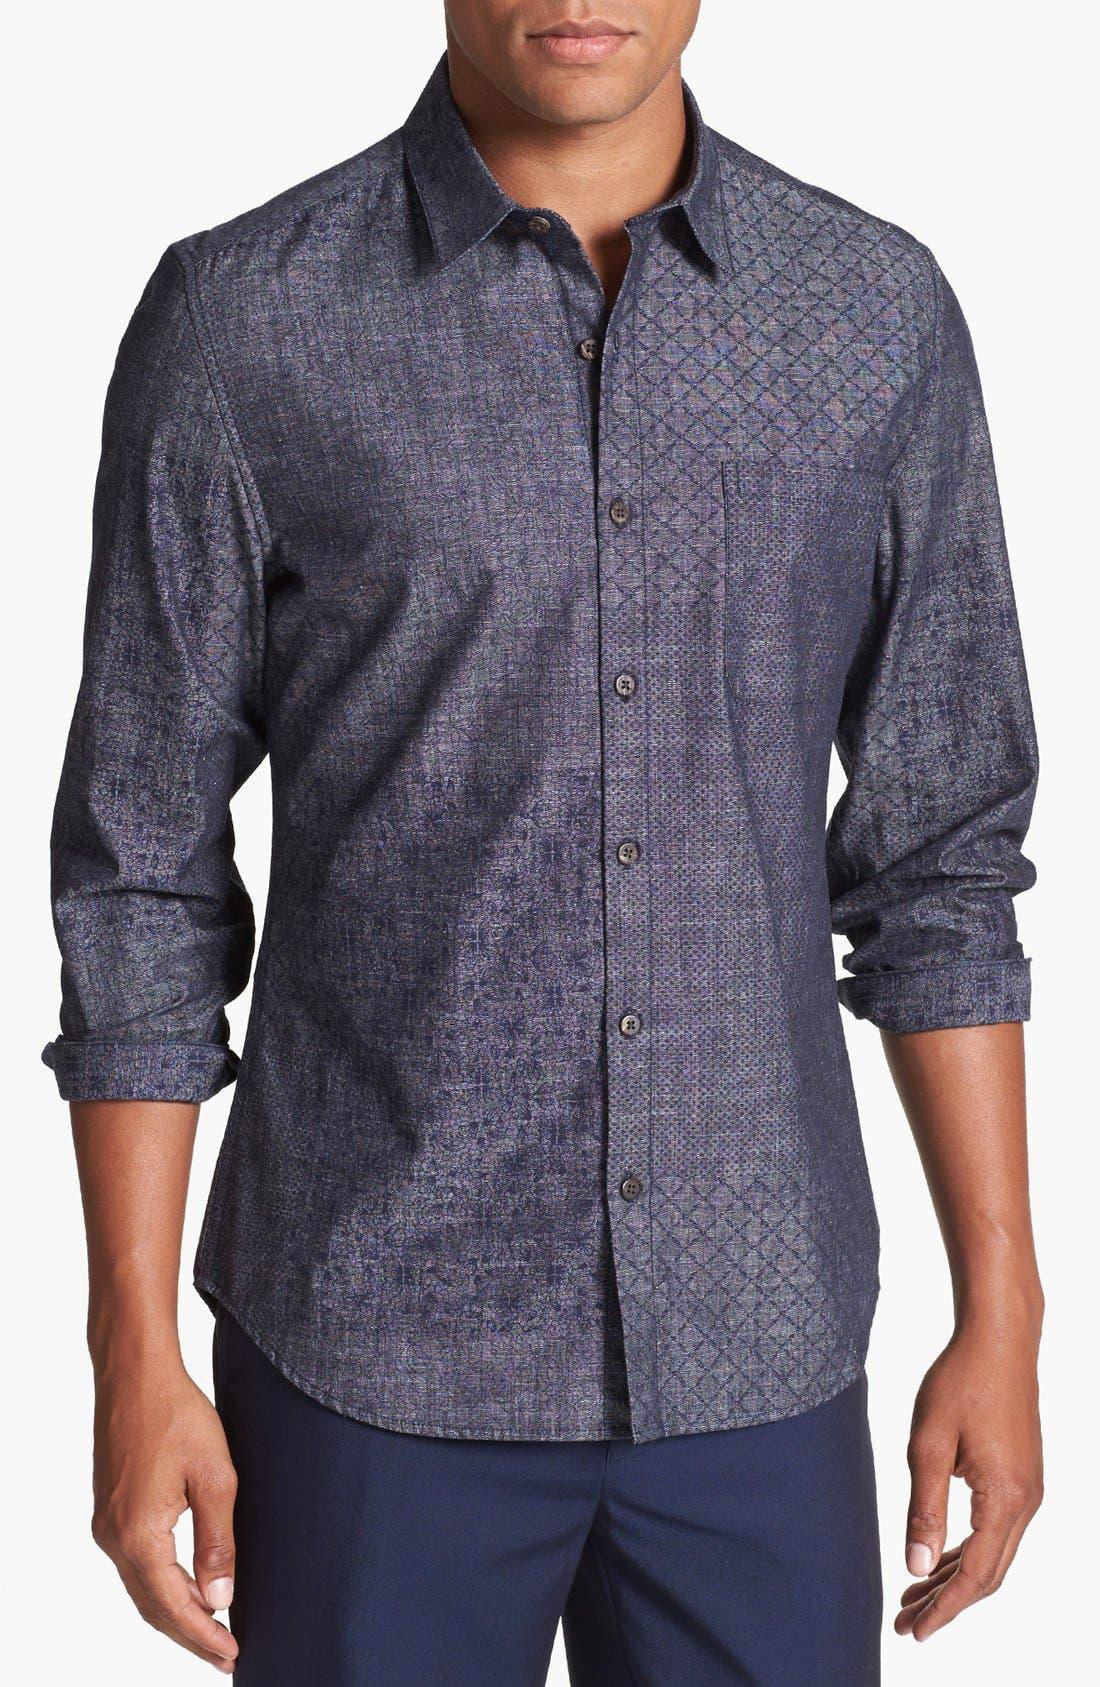 Alternate Image 1 Selected - Topman Mix Print Pattern Chambray Shirt